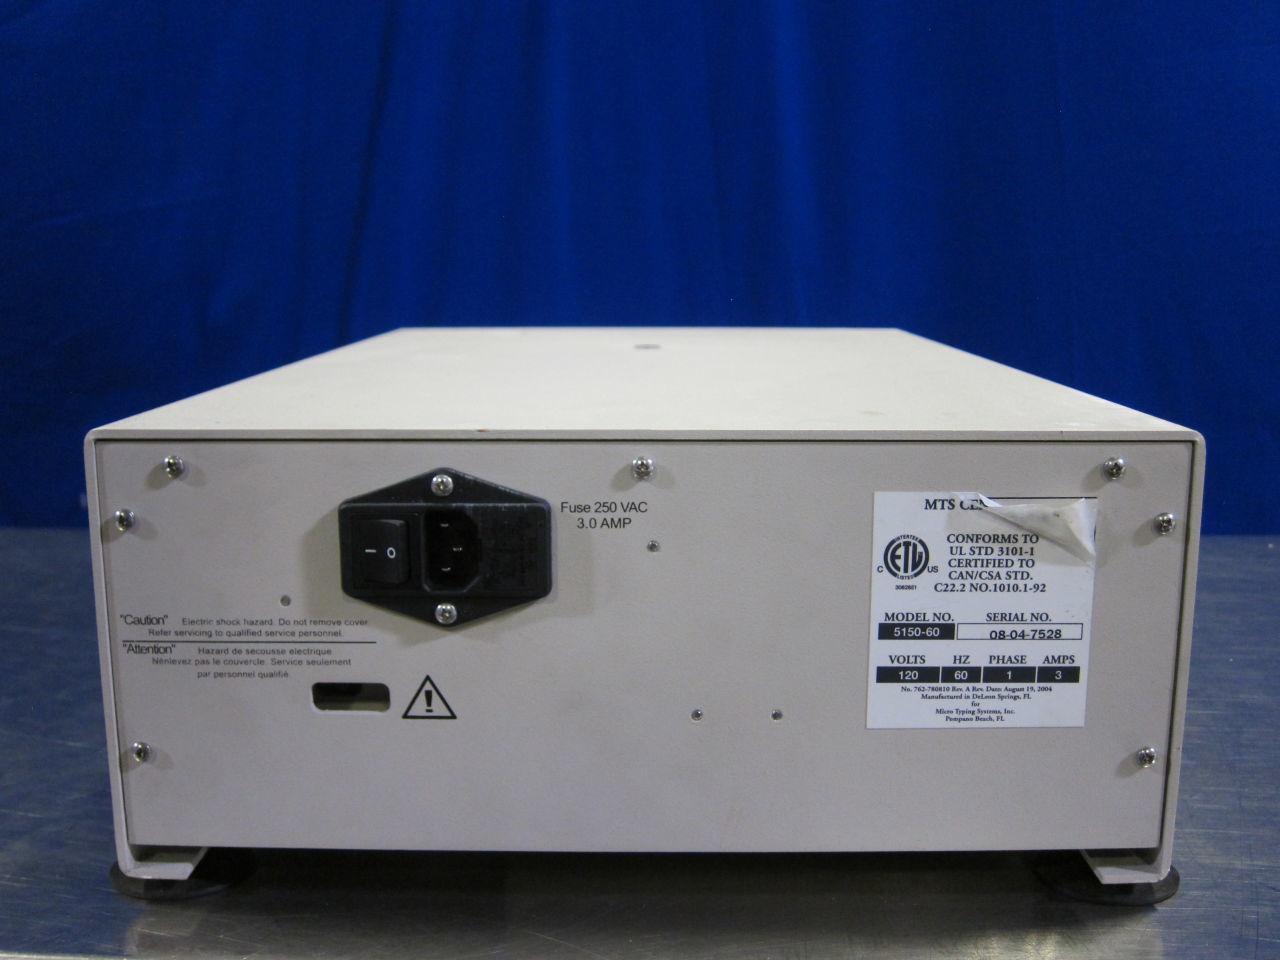 MTS 5150-60 Centrifuge